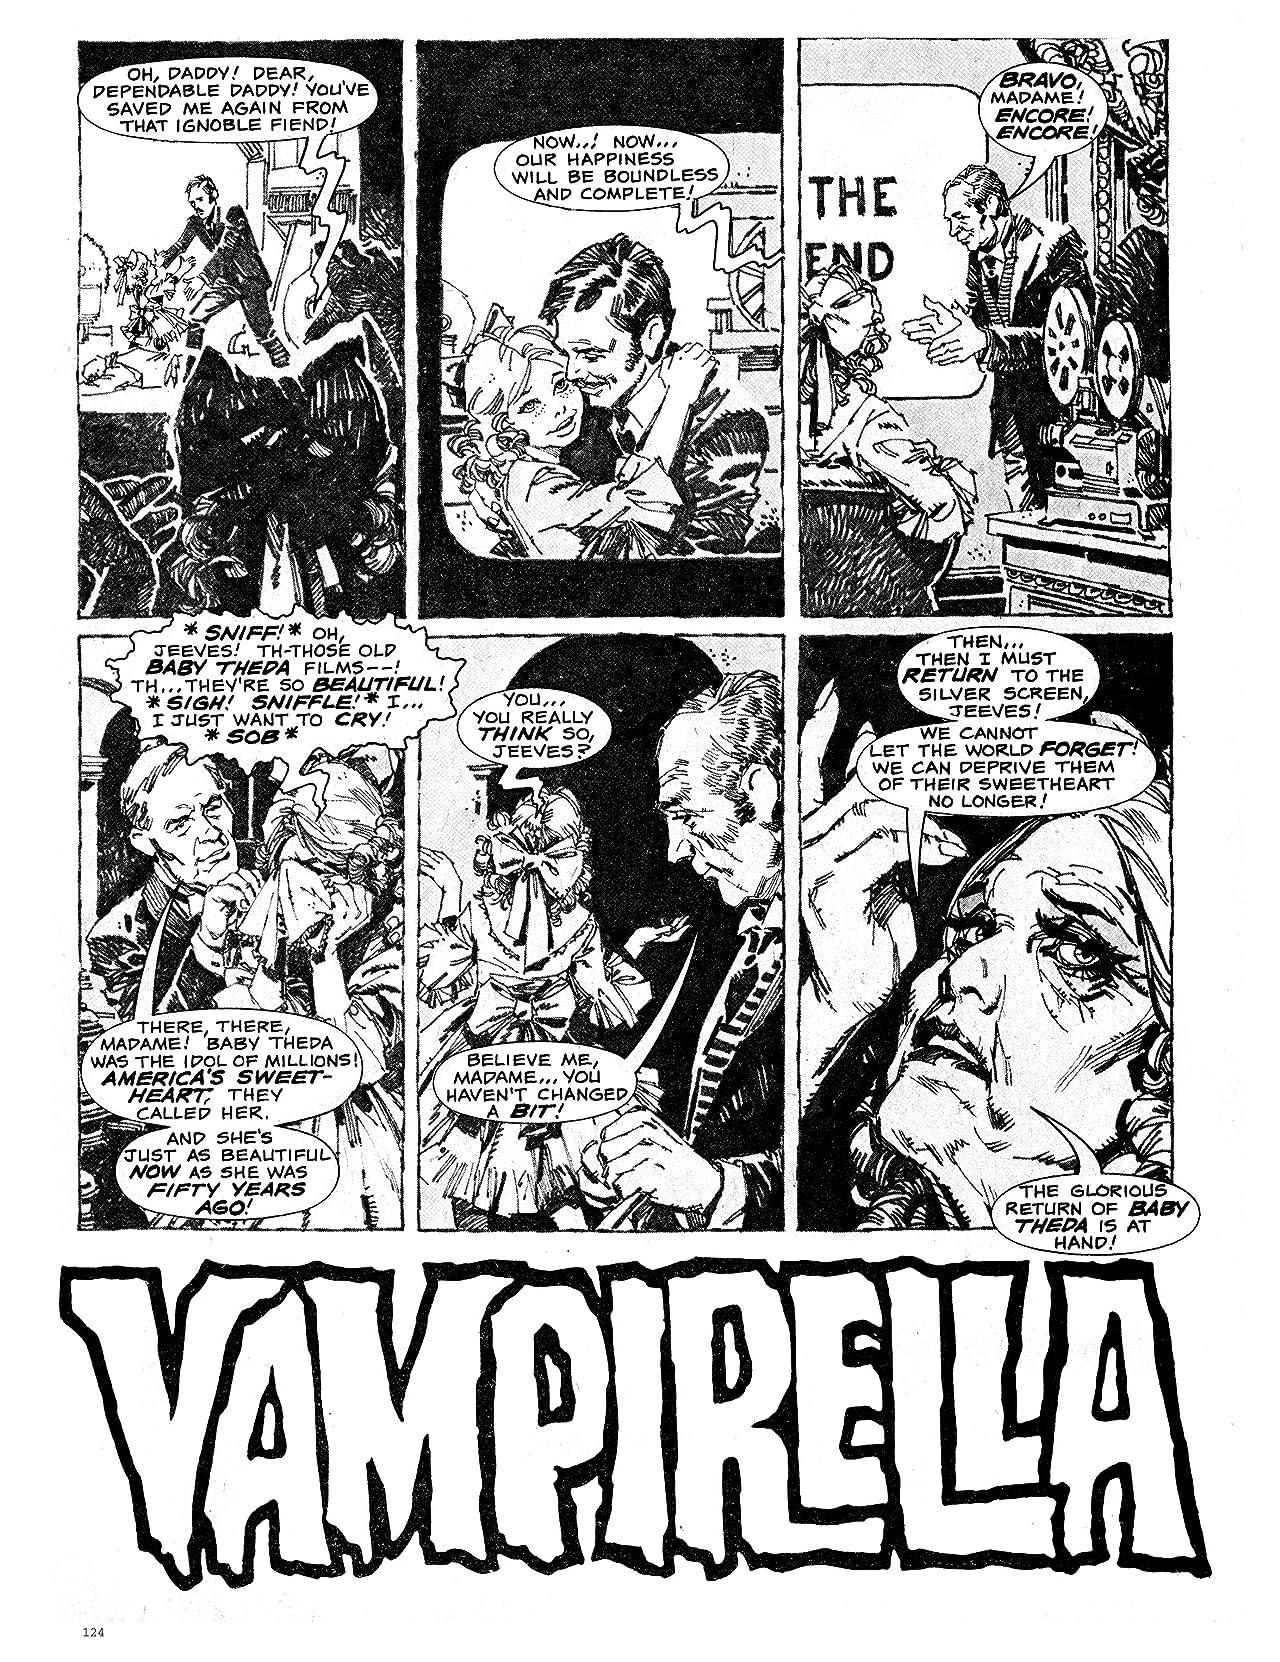 Vampirella (Magazine 1969-1983) #67